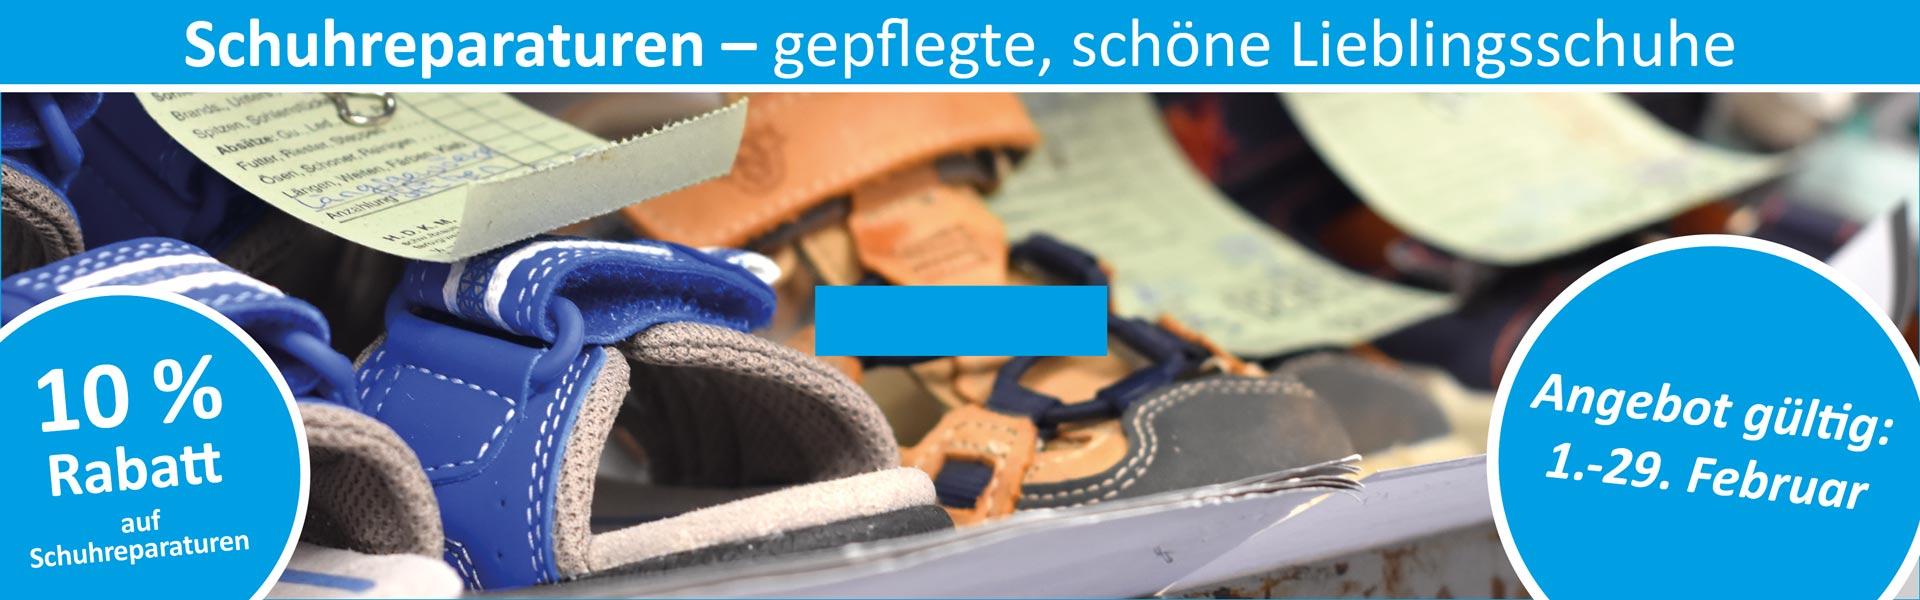 Sanitätshaus Lappe - Rabattaktion Februar 2020 - Schuhreparaturen